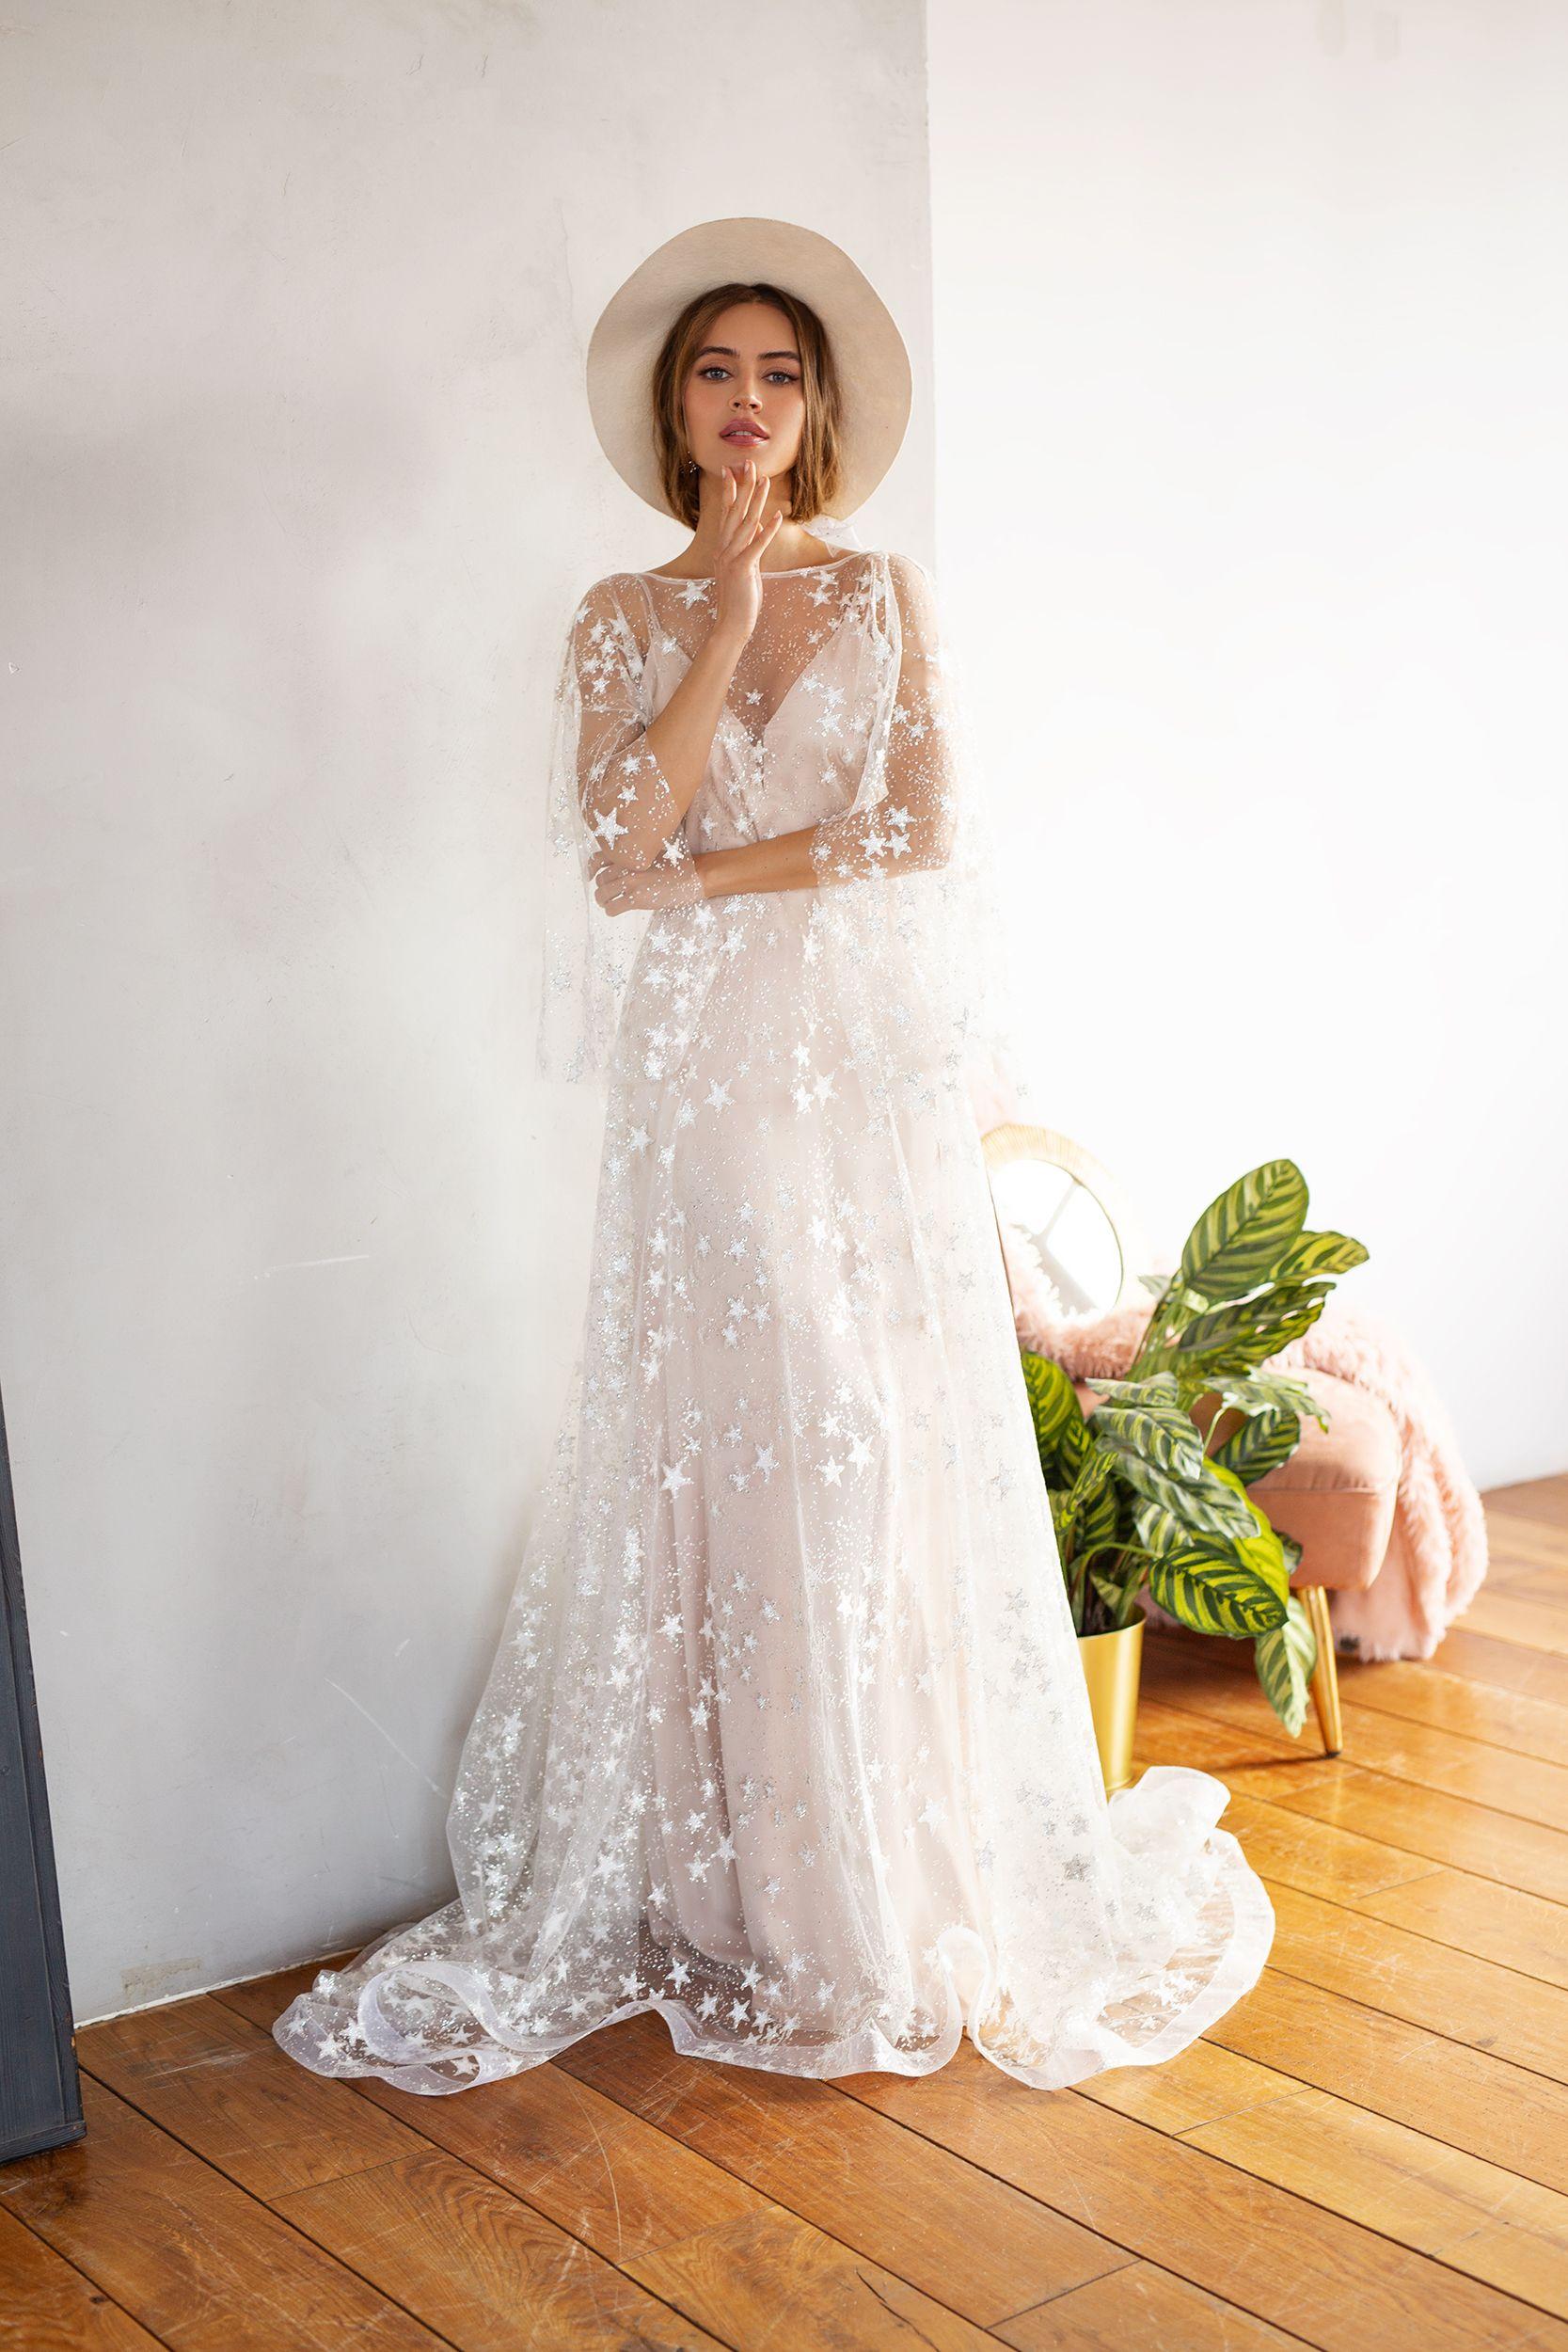 Bohemian Wedding Gown By Dream Dress Mesh Bridal Dress Summer Reception Gown Light Star Dres Bridal Dresses Bohemian Wedding Gown Fall Wedding Dress Sleeves [ 2500 x 1667 Pixel ]